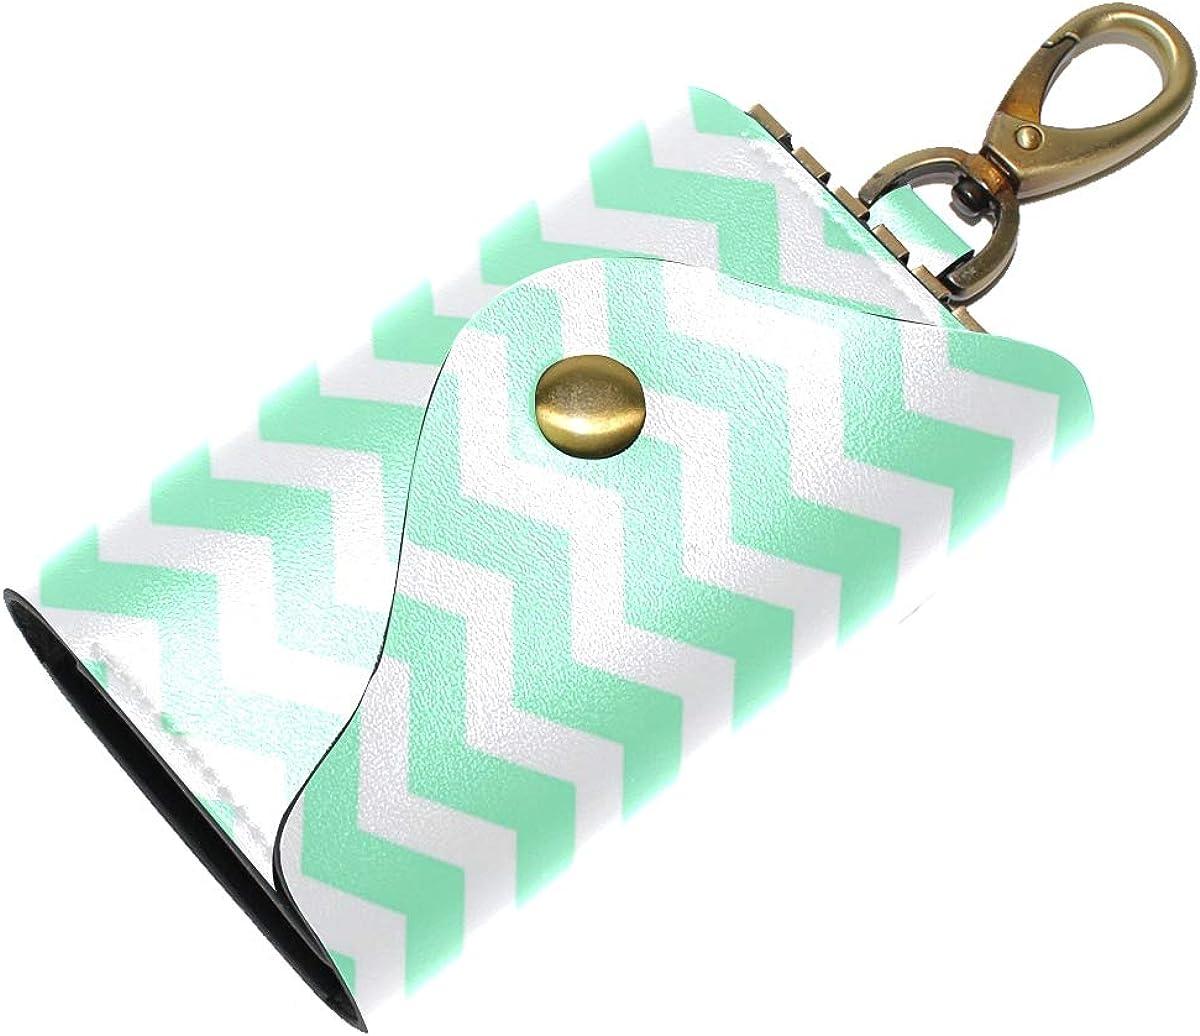 KEAKIA Seafoam Green Chevron Leather Key Case Wallets Tri-fold Key Holder Keychains with 6 Hooks 2 Slot Snap Closure for Men Women